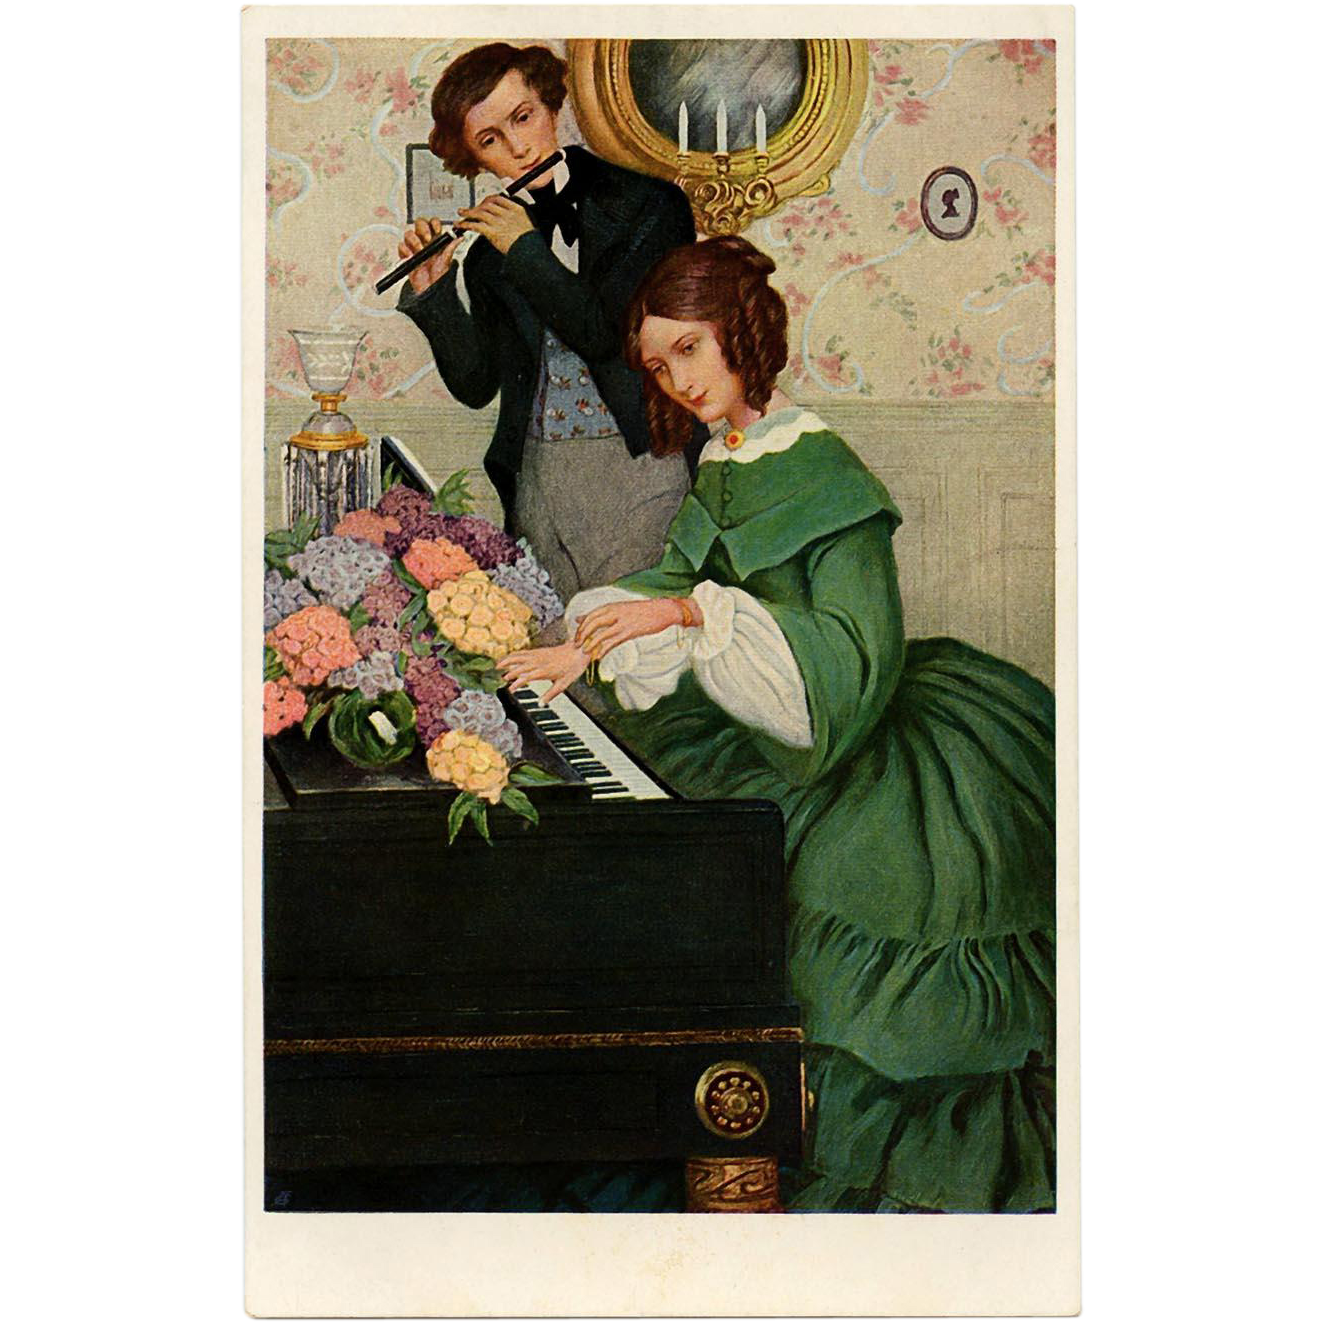 Musical Edwardian Couple Anna Whelan Betts Antique M.M. Vienne Postcard Unused Mint Condition